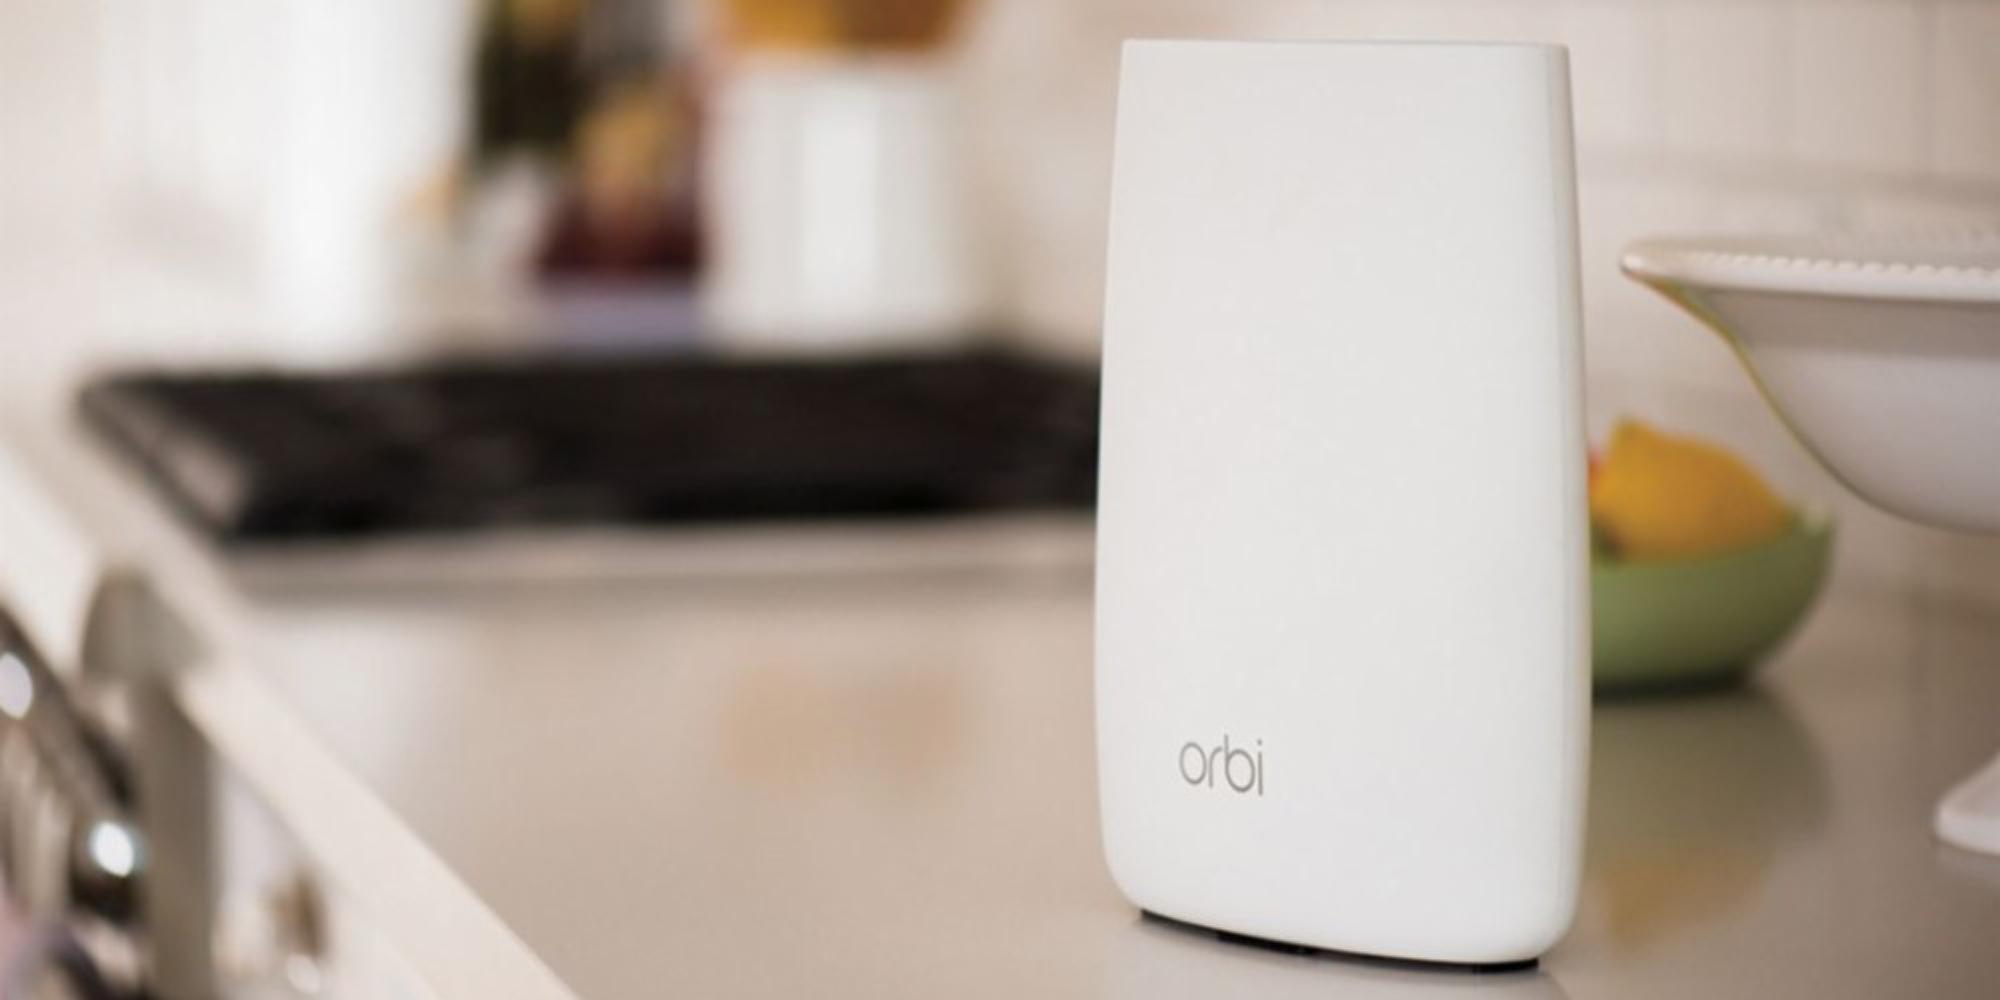 Mesh Wi-Fi awaits with NETGEAR's Orbi 802.11ac Tri-Band System at $260 shipped (Reg. $330)